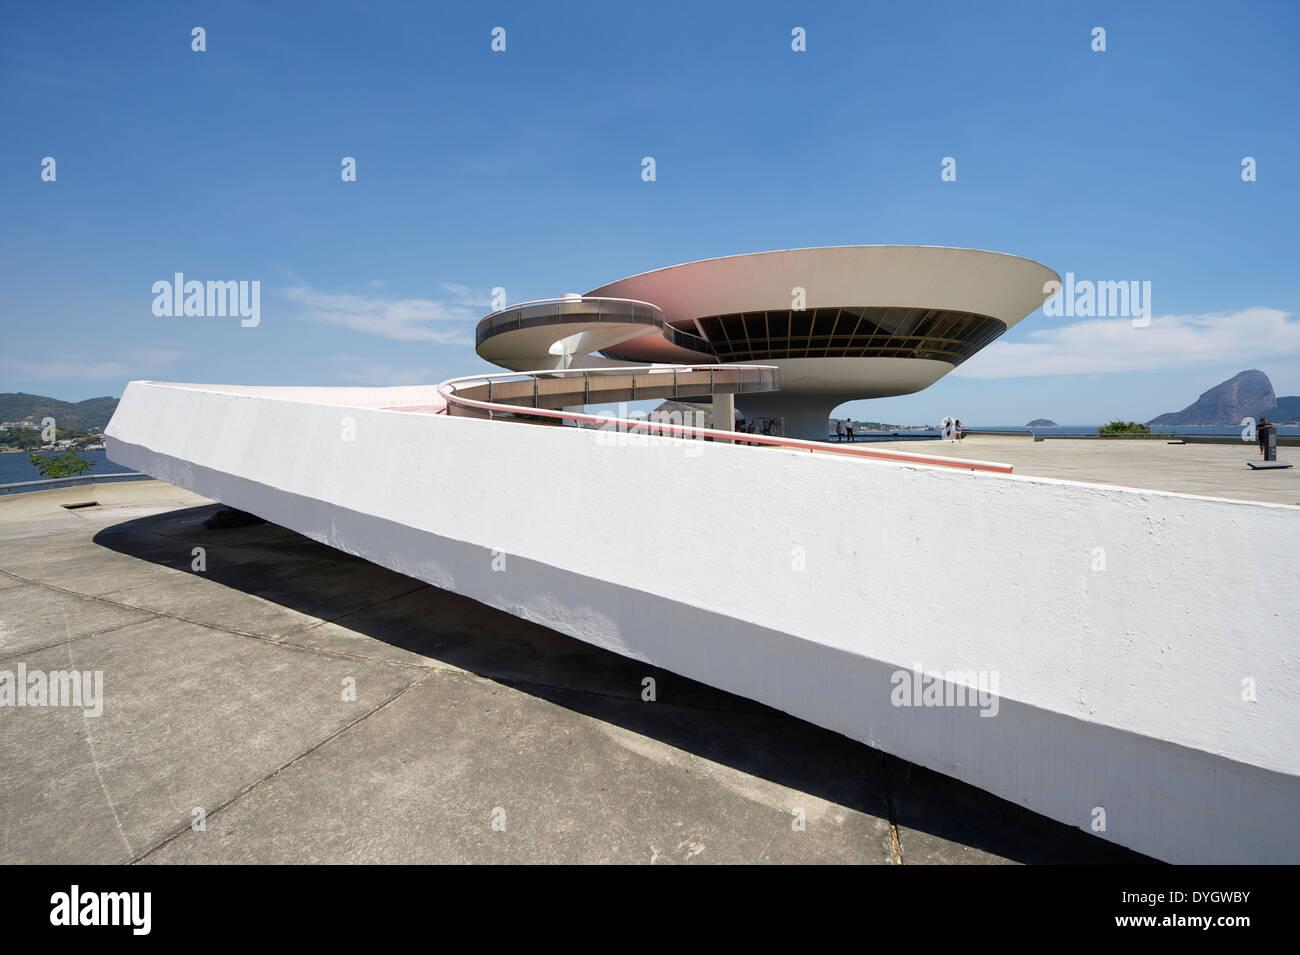 RIO DE JANEIRO, BRAZIL - FEBRUARY 4, 2014: The modernist Niteroi Contemporary Art Museum (MAC) by Oscar Niemeyer features a ramp - Stock Image